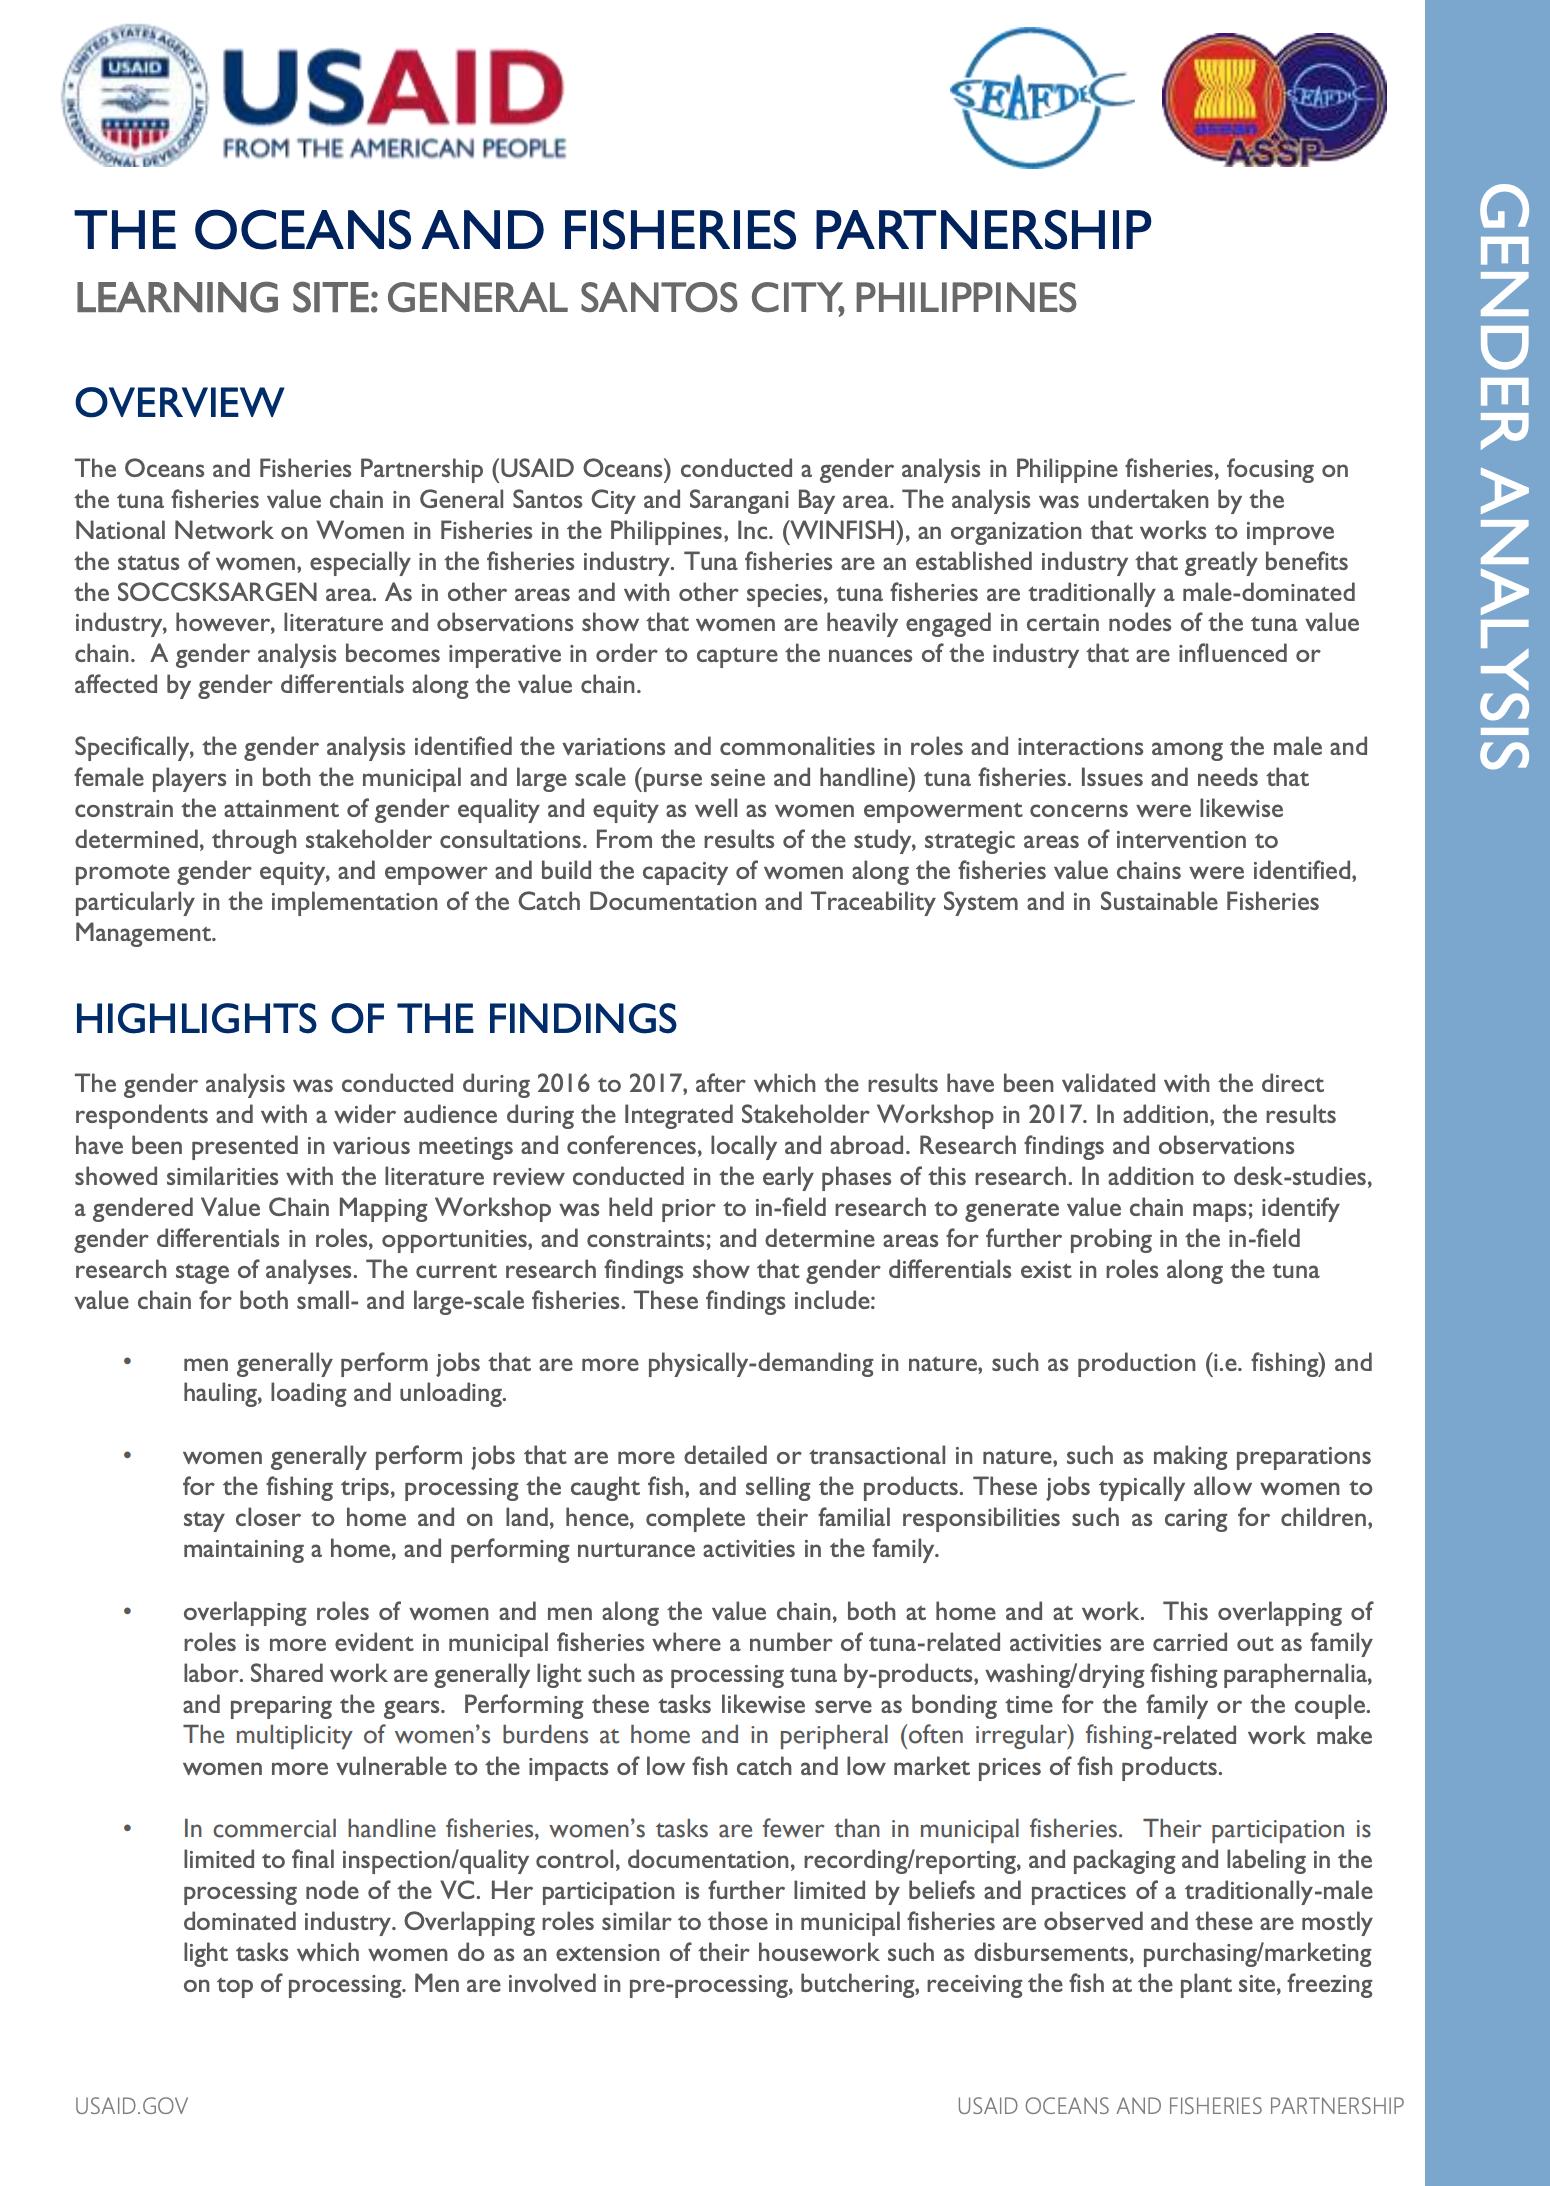 Philippines Gender Analysis Summary